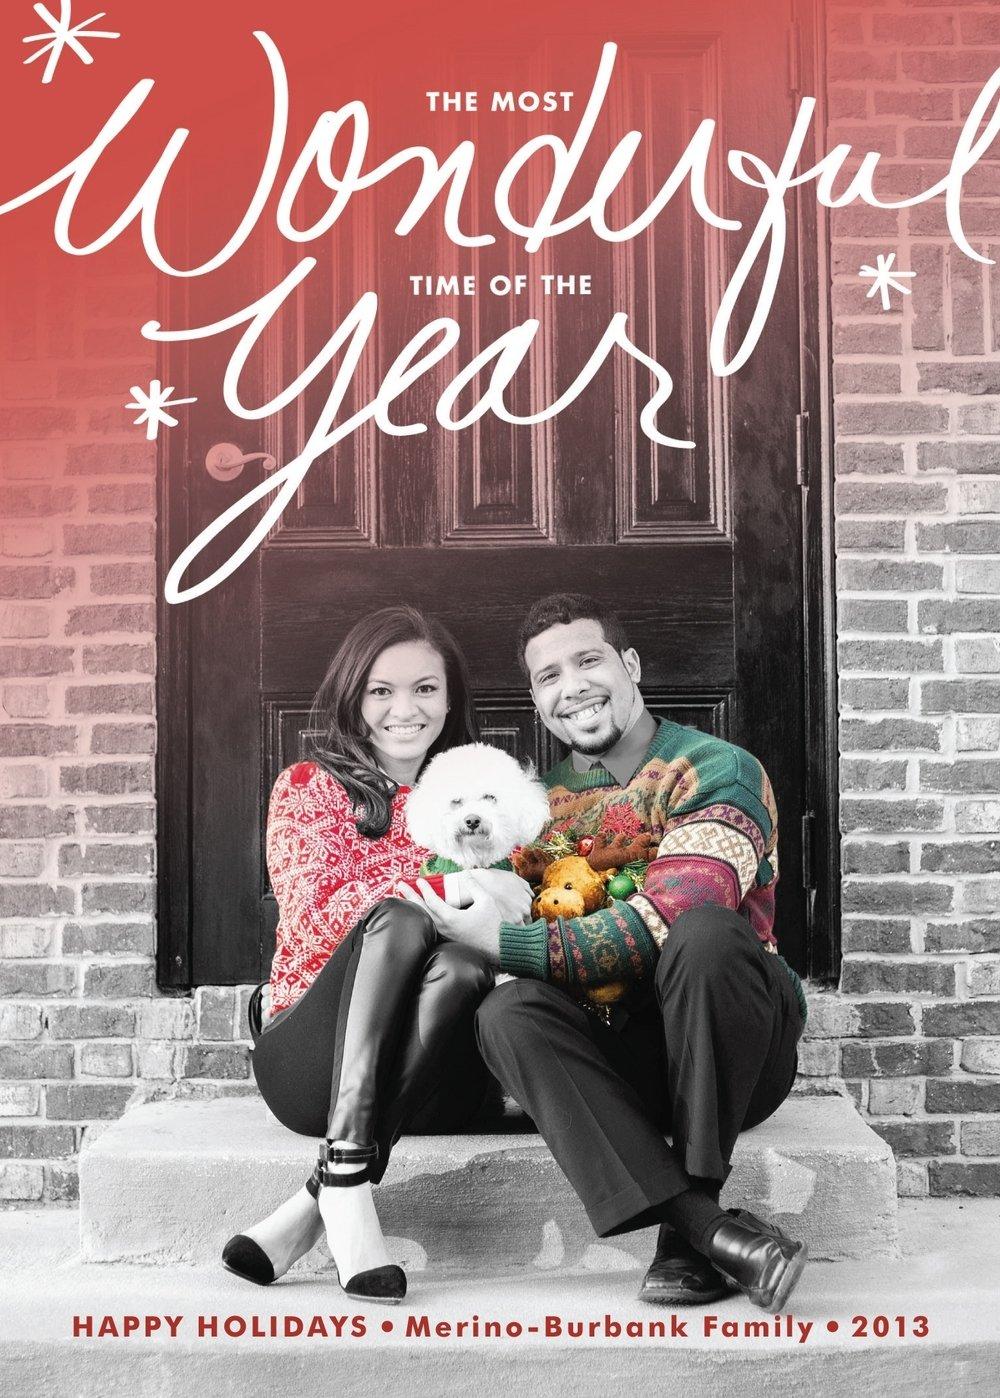 10 Fashionable Christmas Card Ideas For Couples christmas card ideas for couples with dogs happy holidays 2021